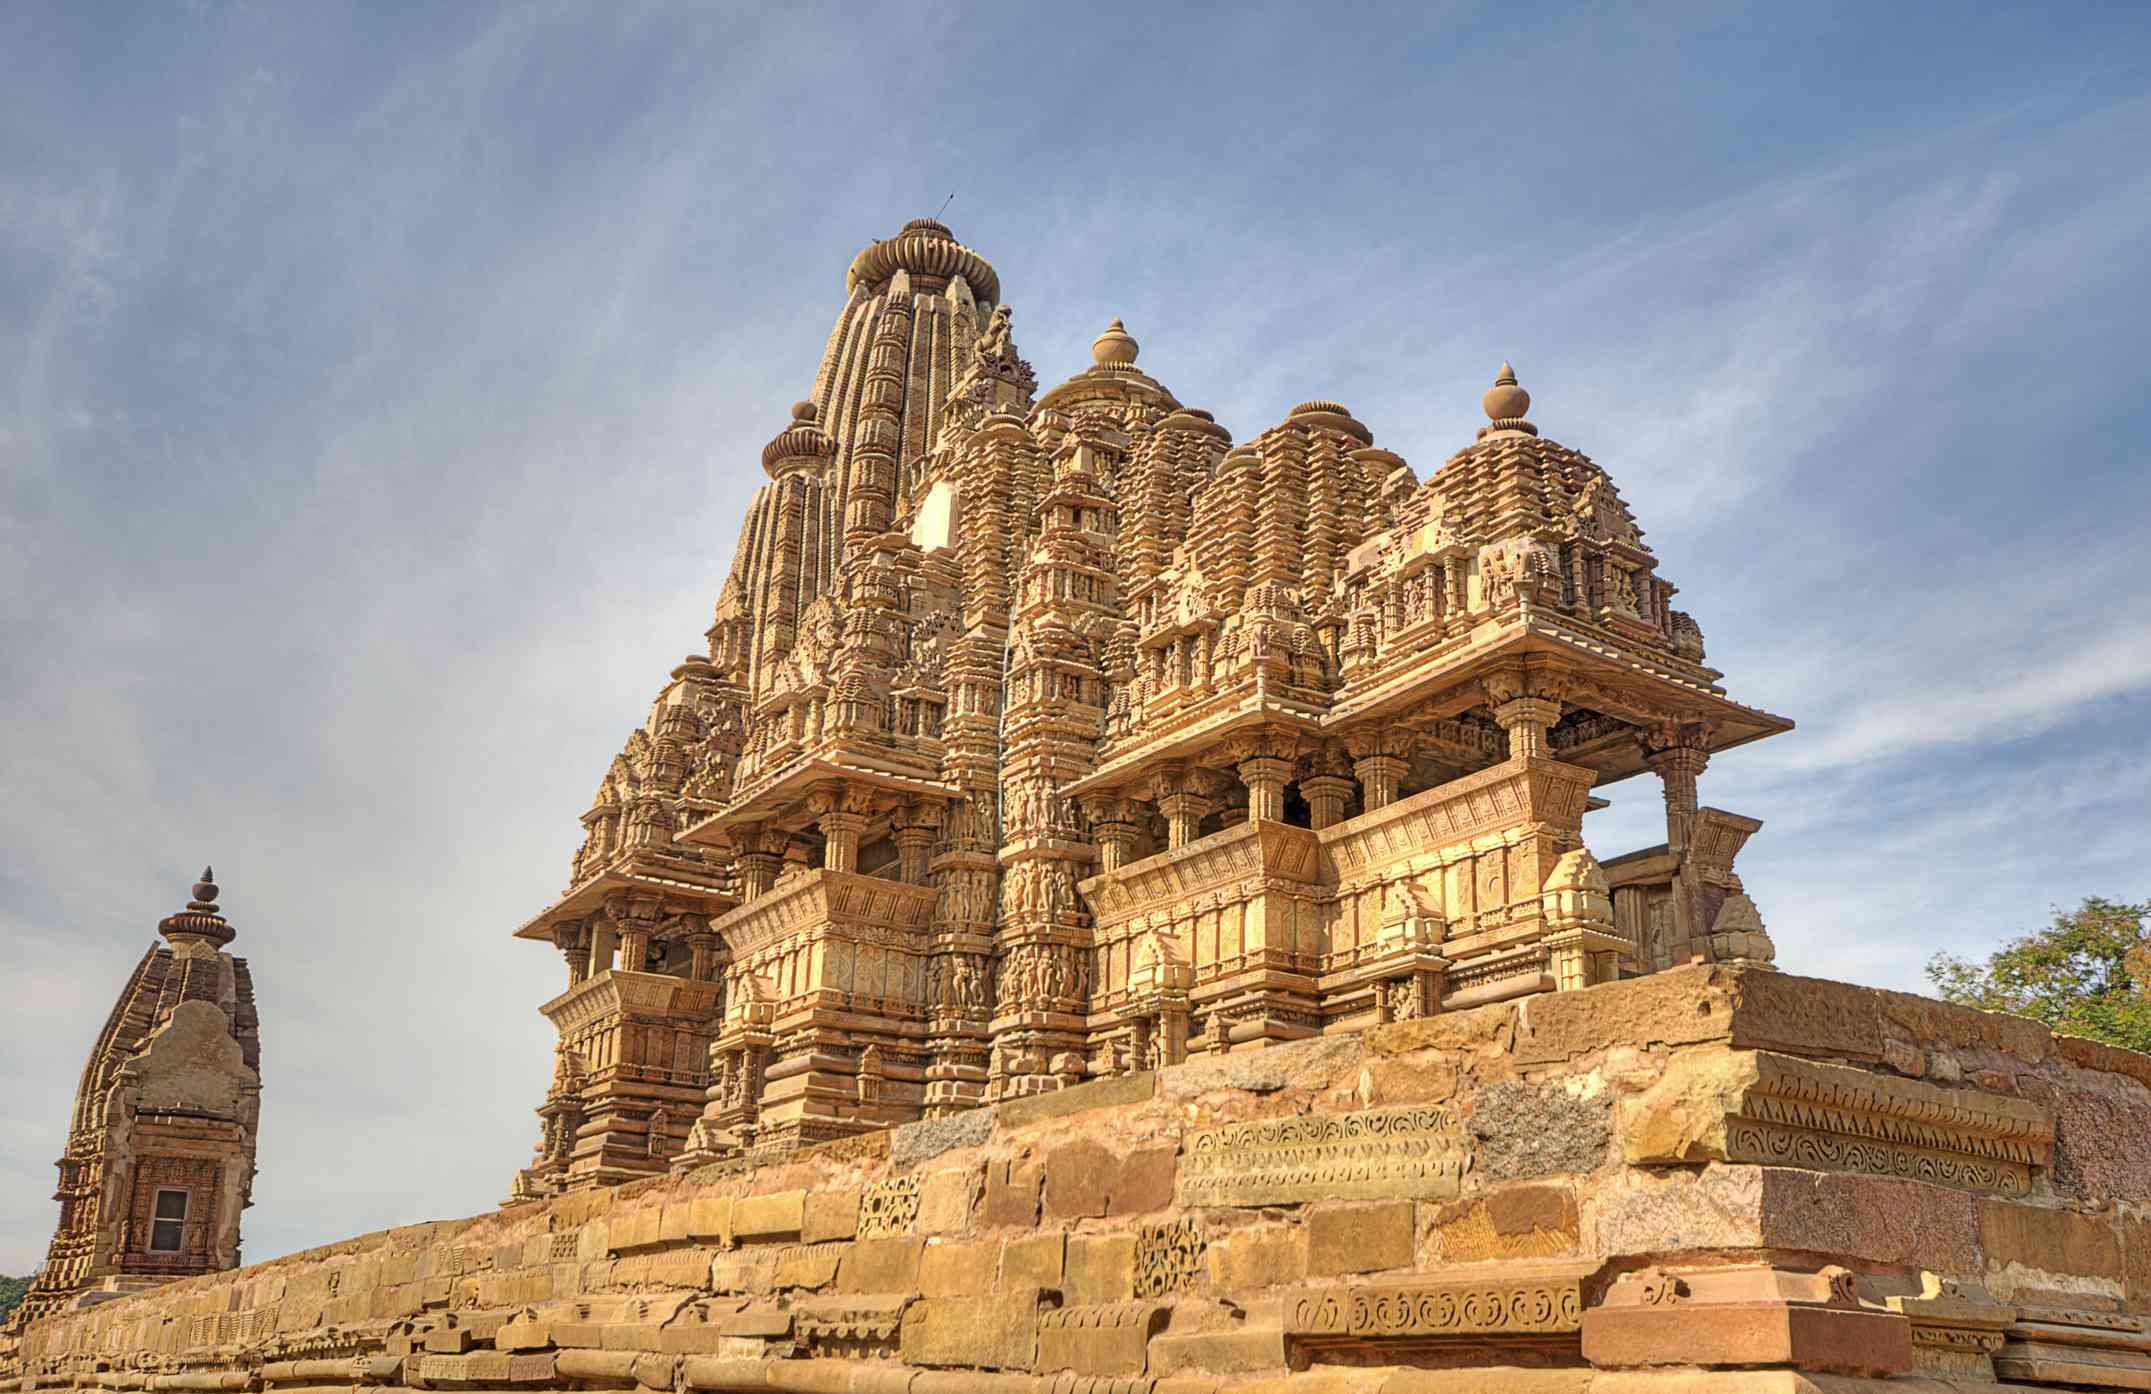 Vishwanatha Temple, Khajuraho, India